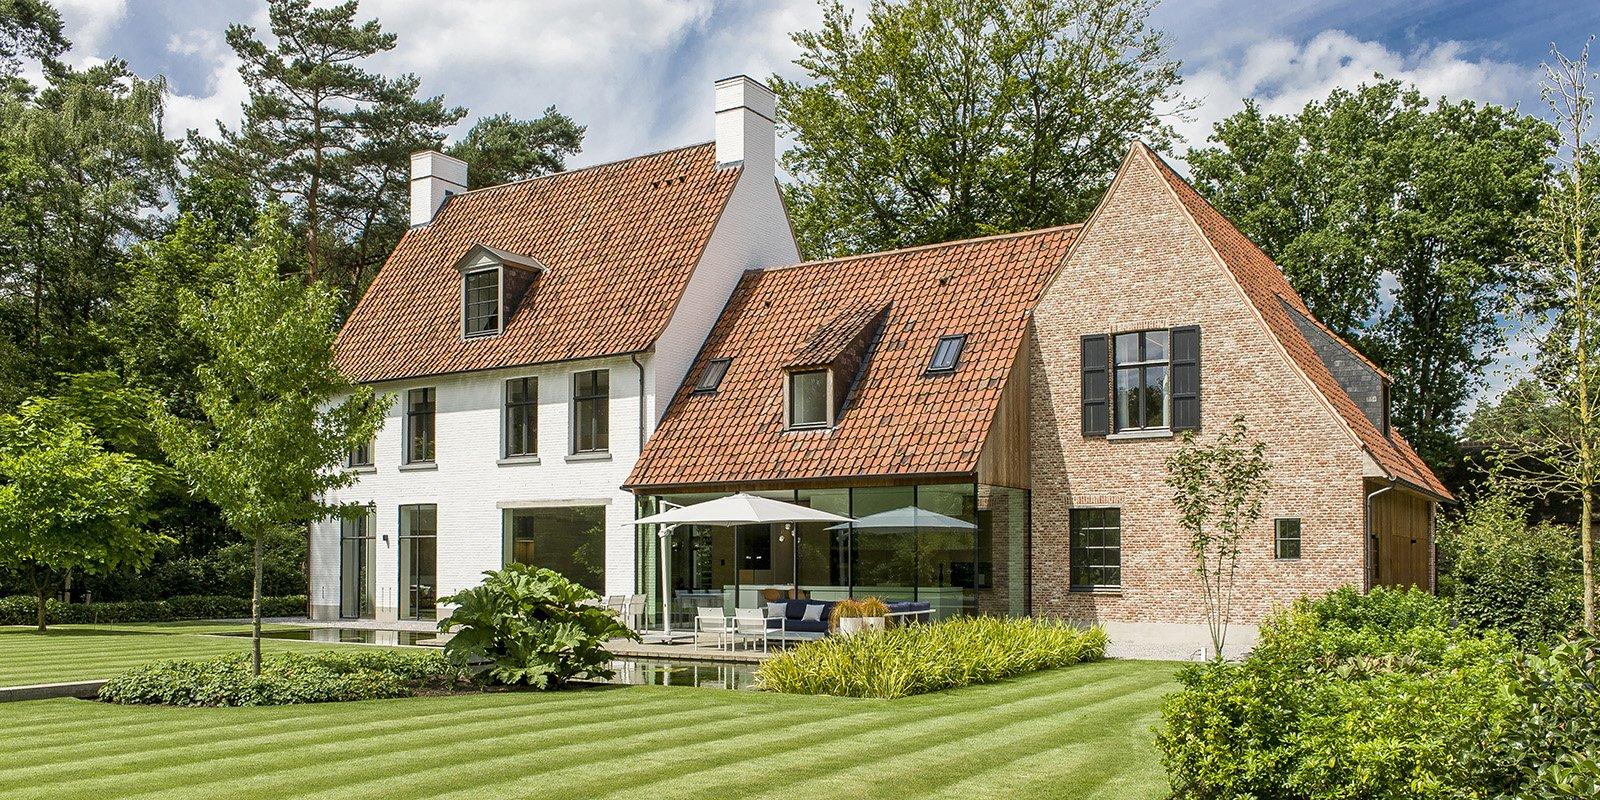 Strakke tuin, Pieter Vlassak, Vlassak Architects, Less is more, Zwevend terras, Lounge, Vijver